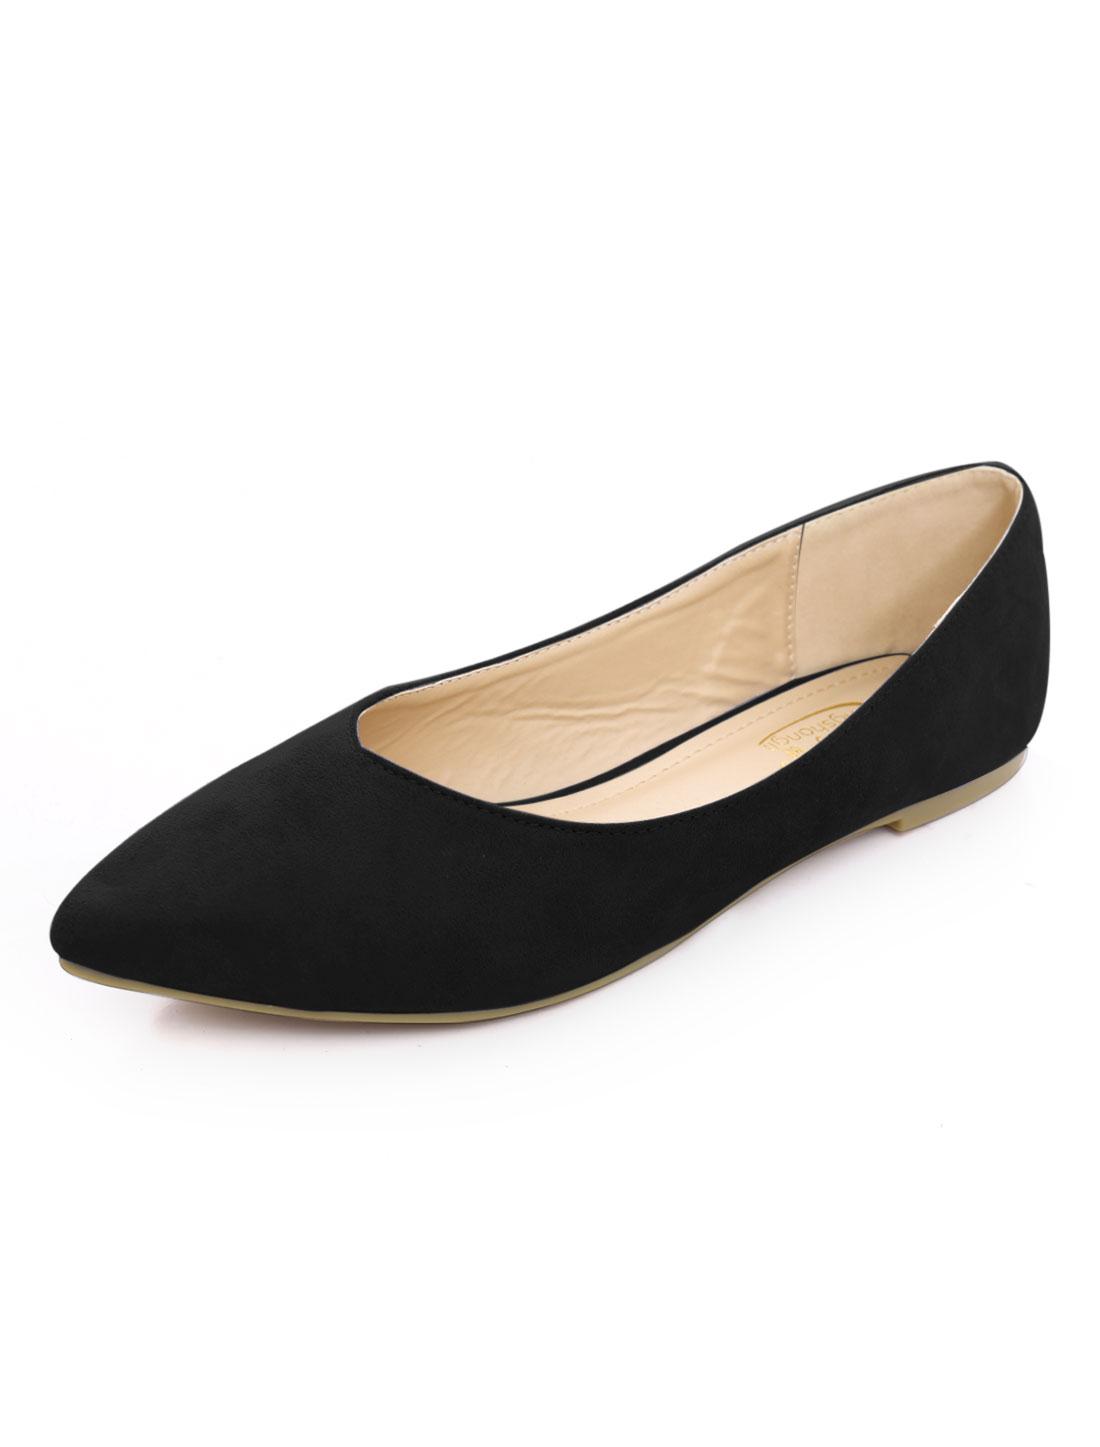 Women Faux Suede Pointed Ballet Flats Casual Comfort Shoes Bronze Black US 8